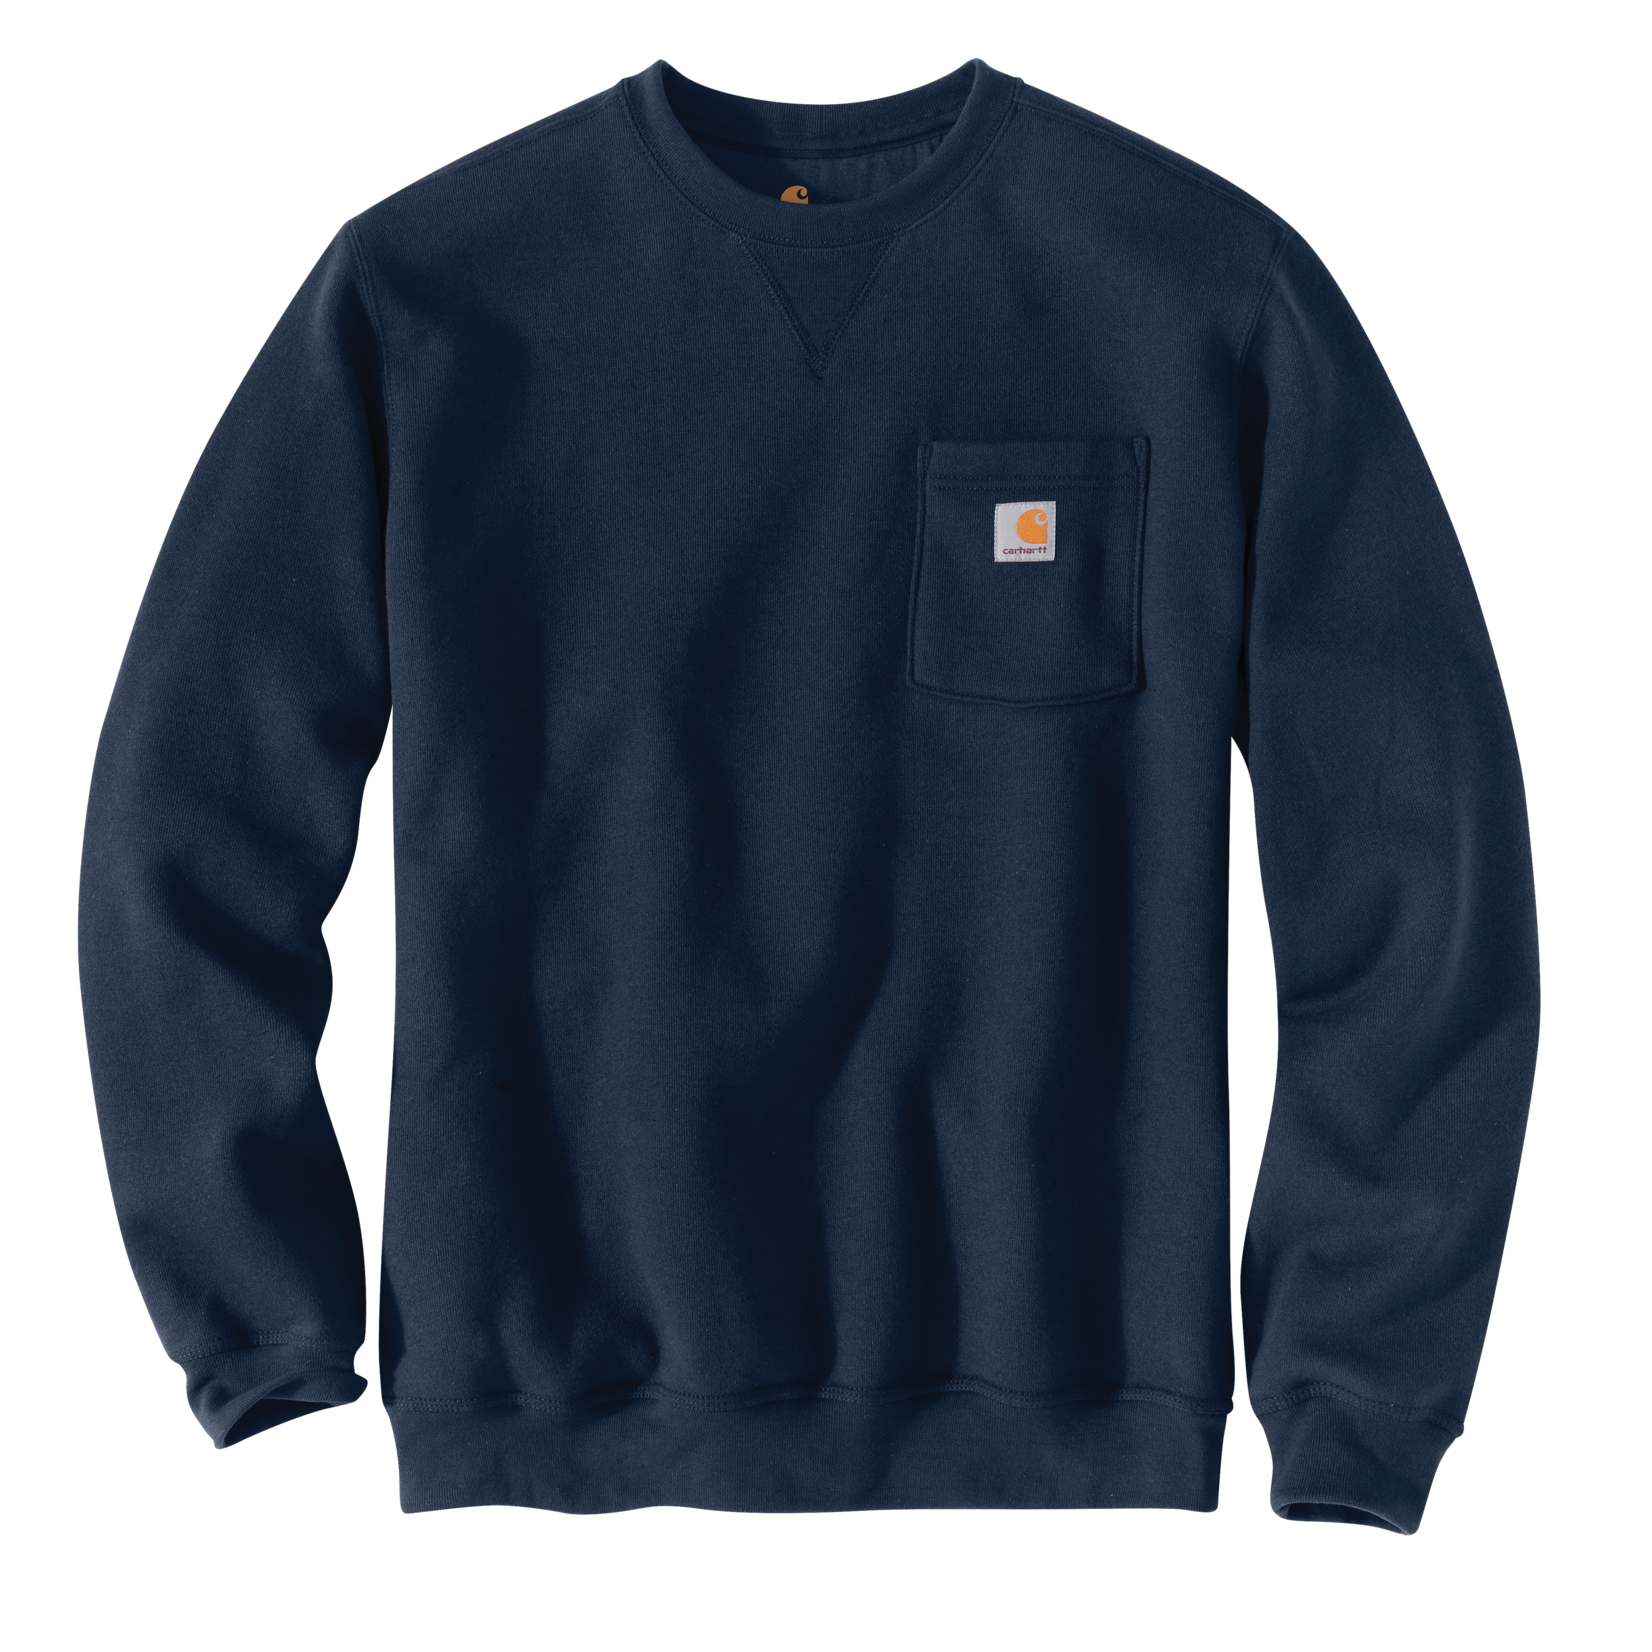 Carhartt Carhartt 103852 Loose Fit Midweight Crewneck Pocket Sweatshirt - 472 New Navy